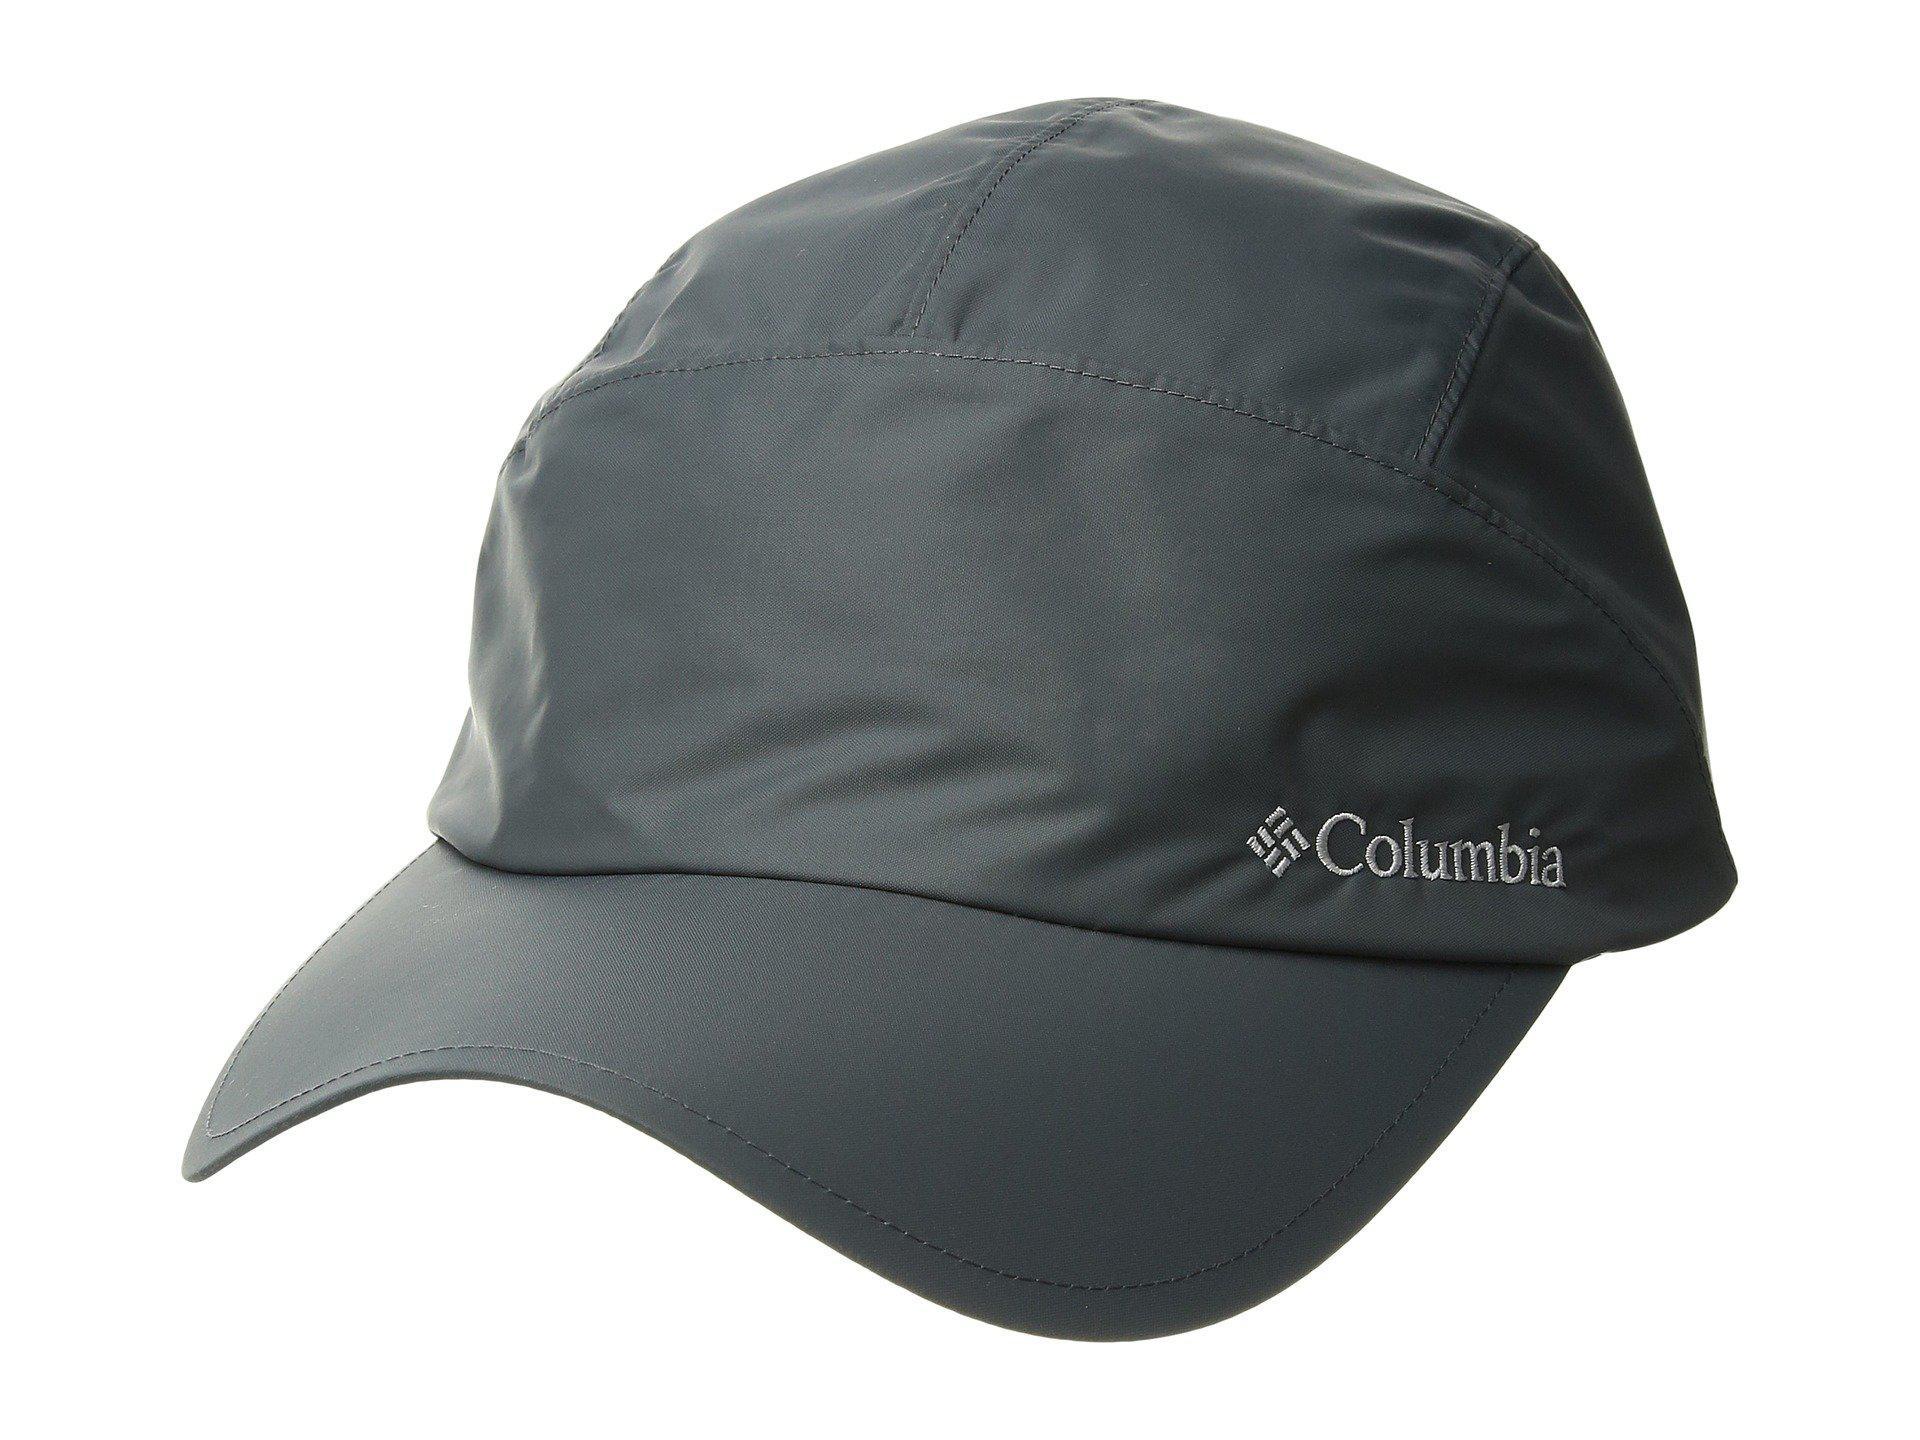 d641711c19d Lyst - Columbia Watertighttm Cap (graphite  Grey) Caps in Gray for Men